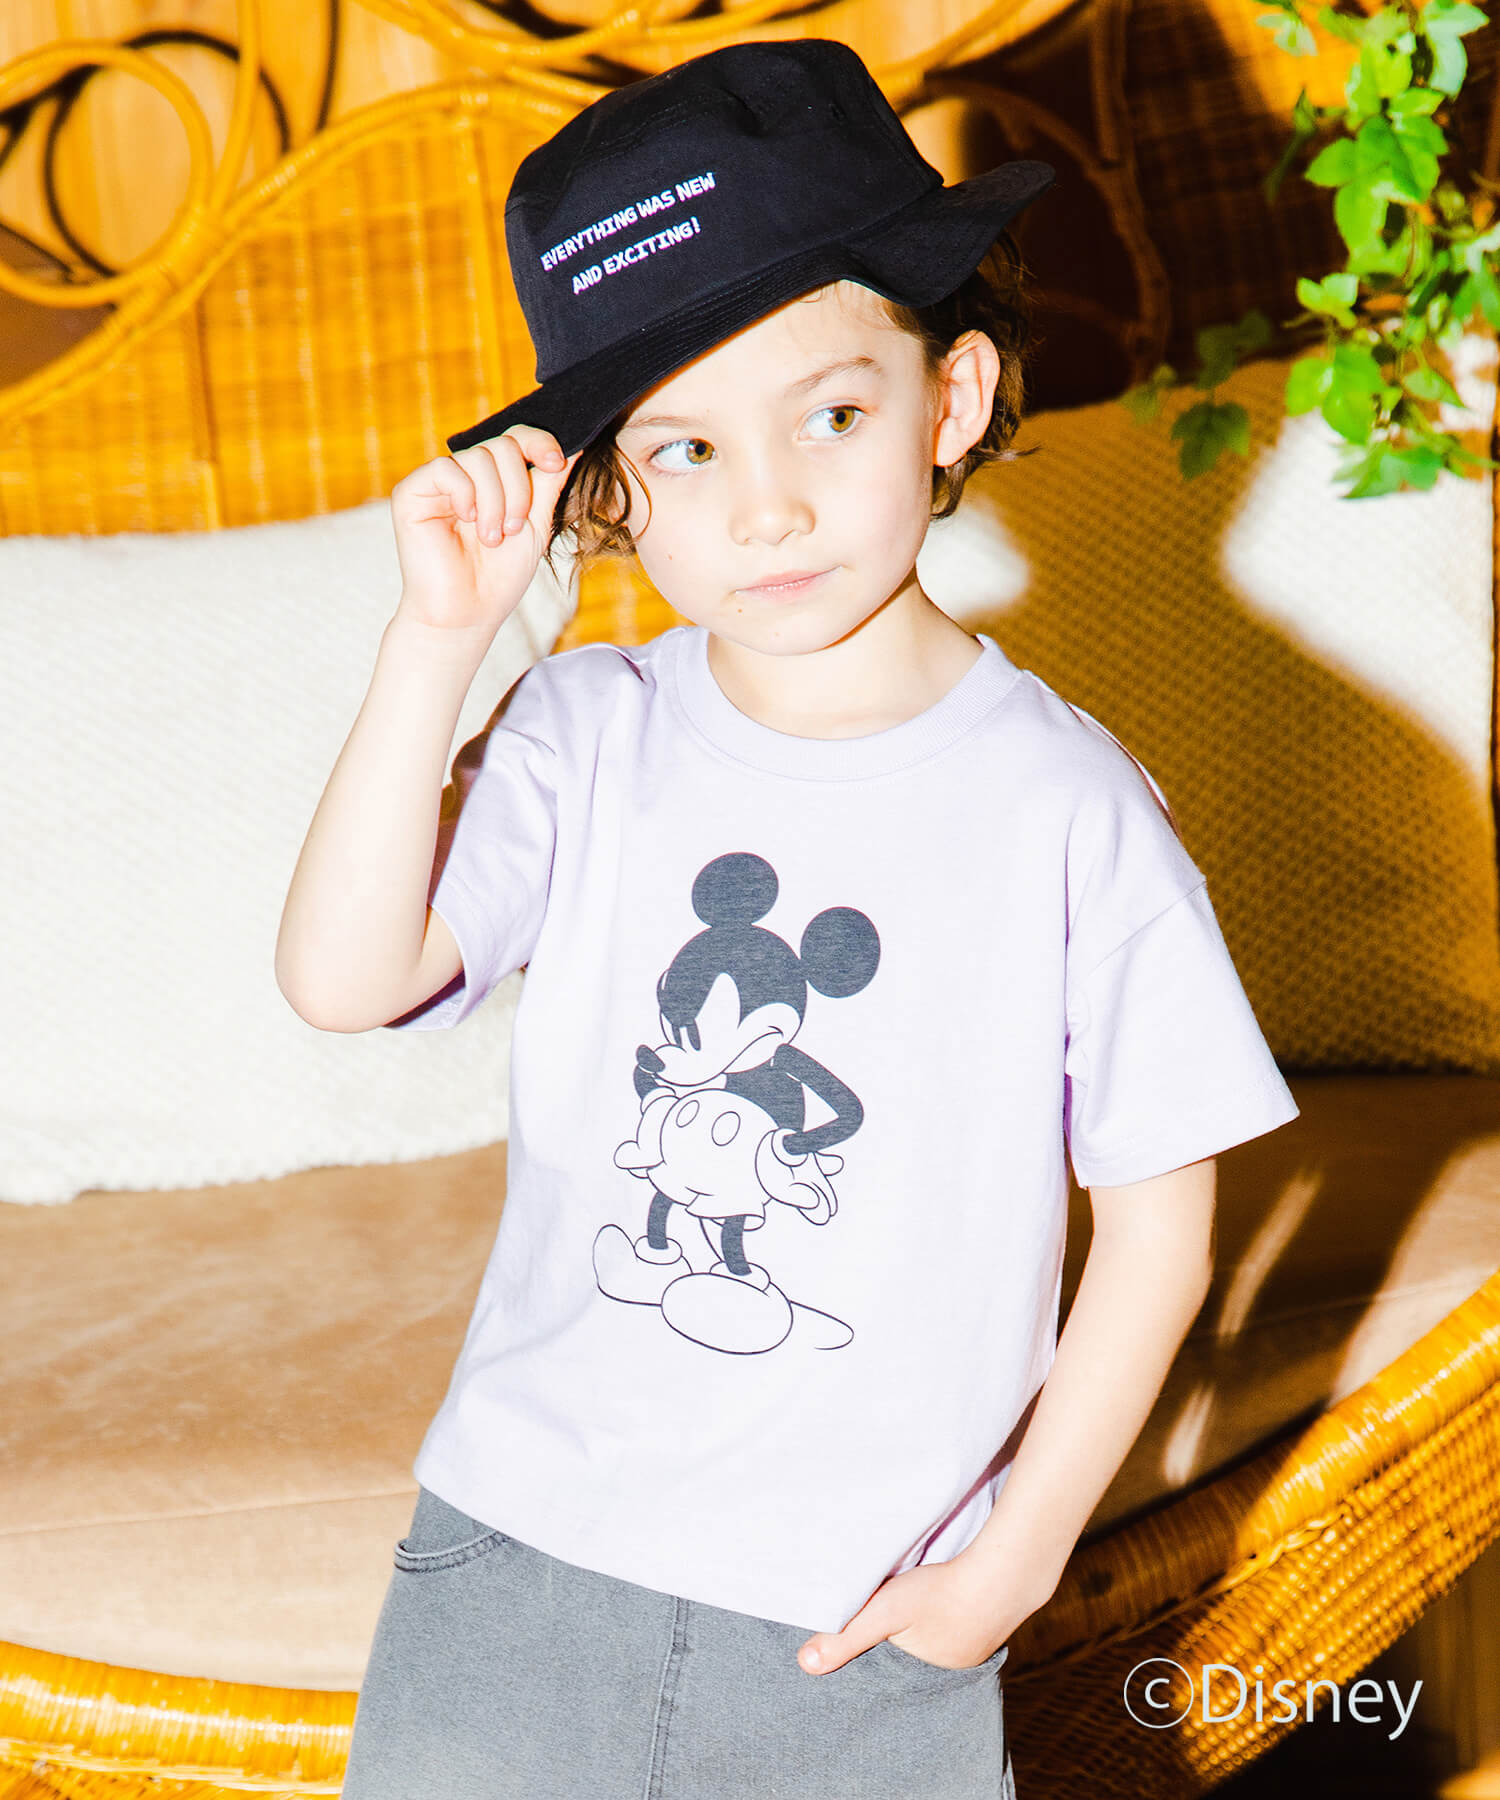 【Disney】モノトーンプリント半袖Tシャツ